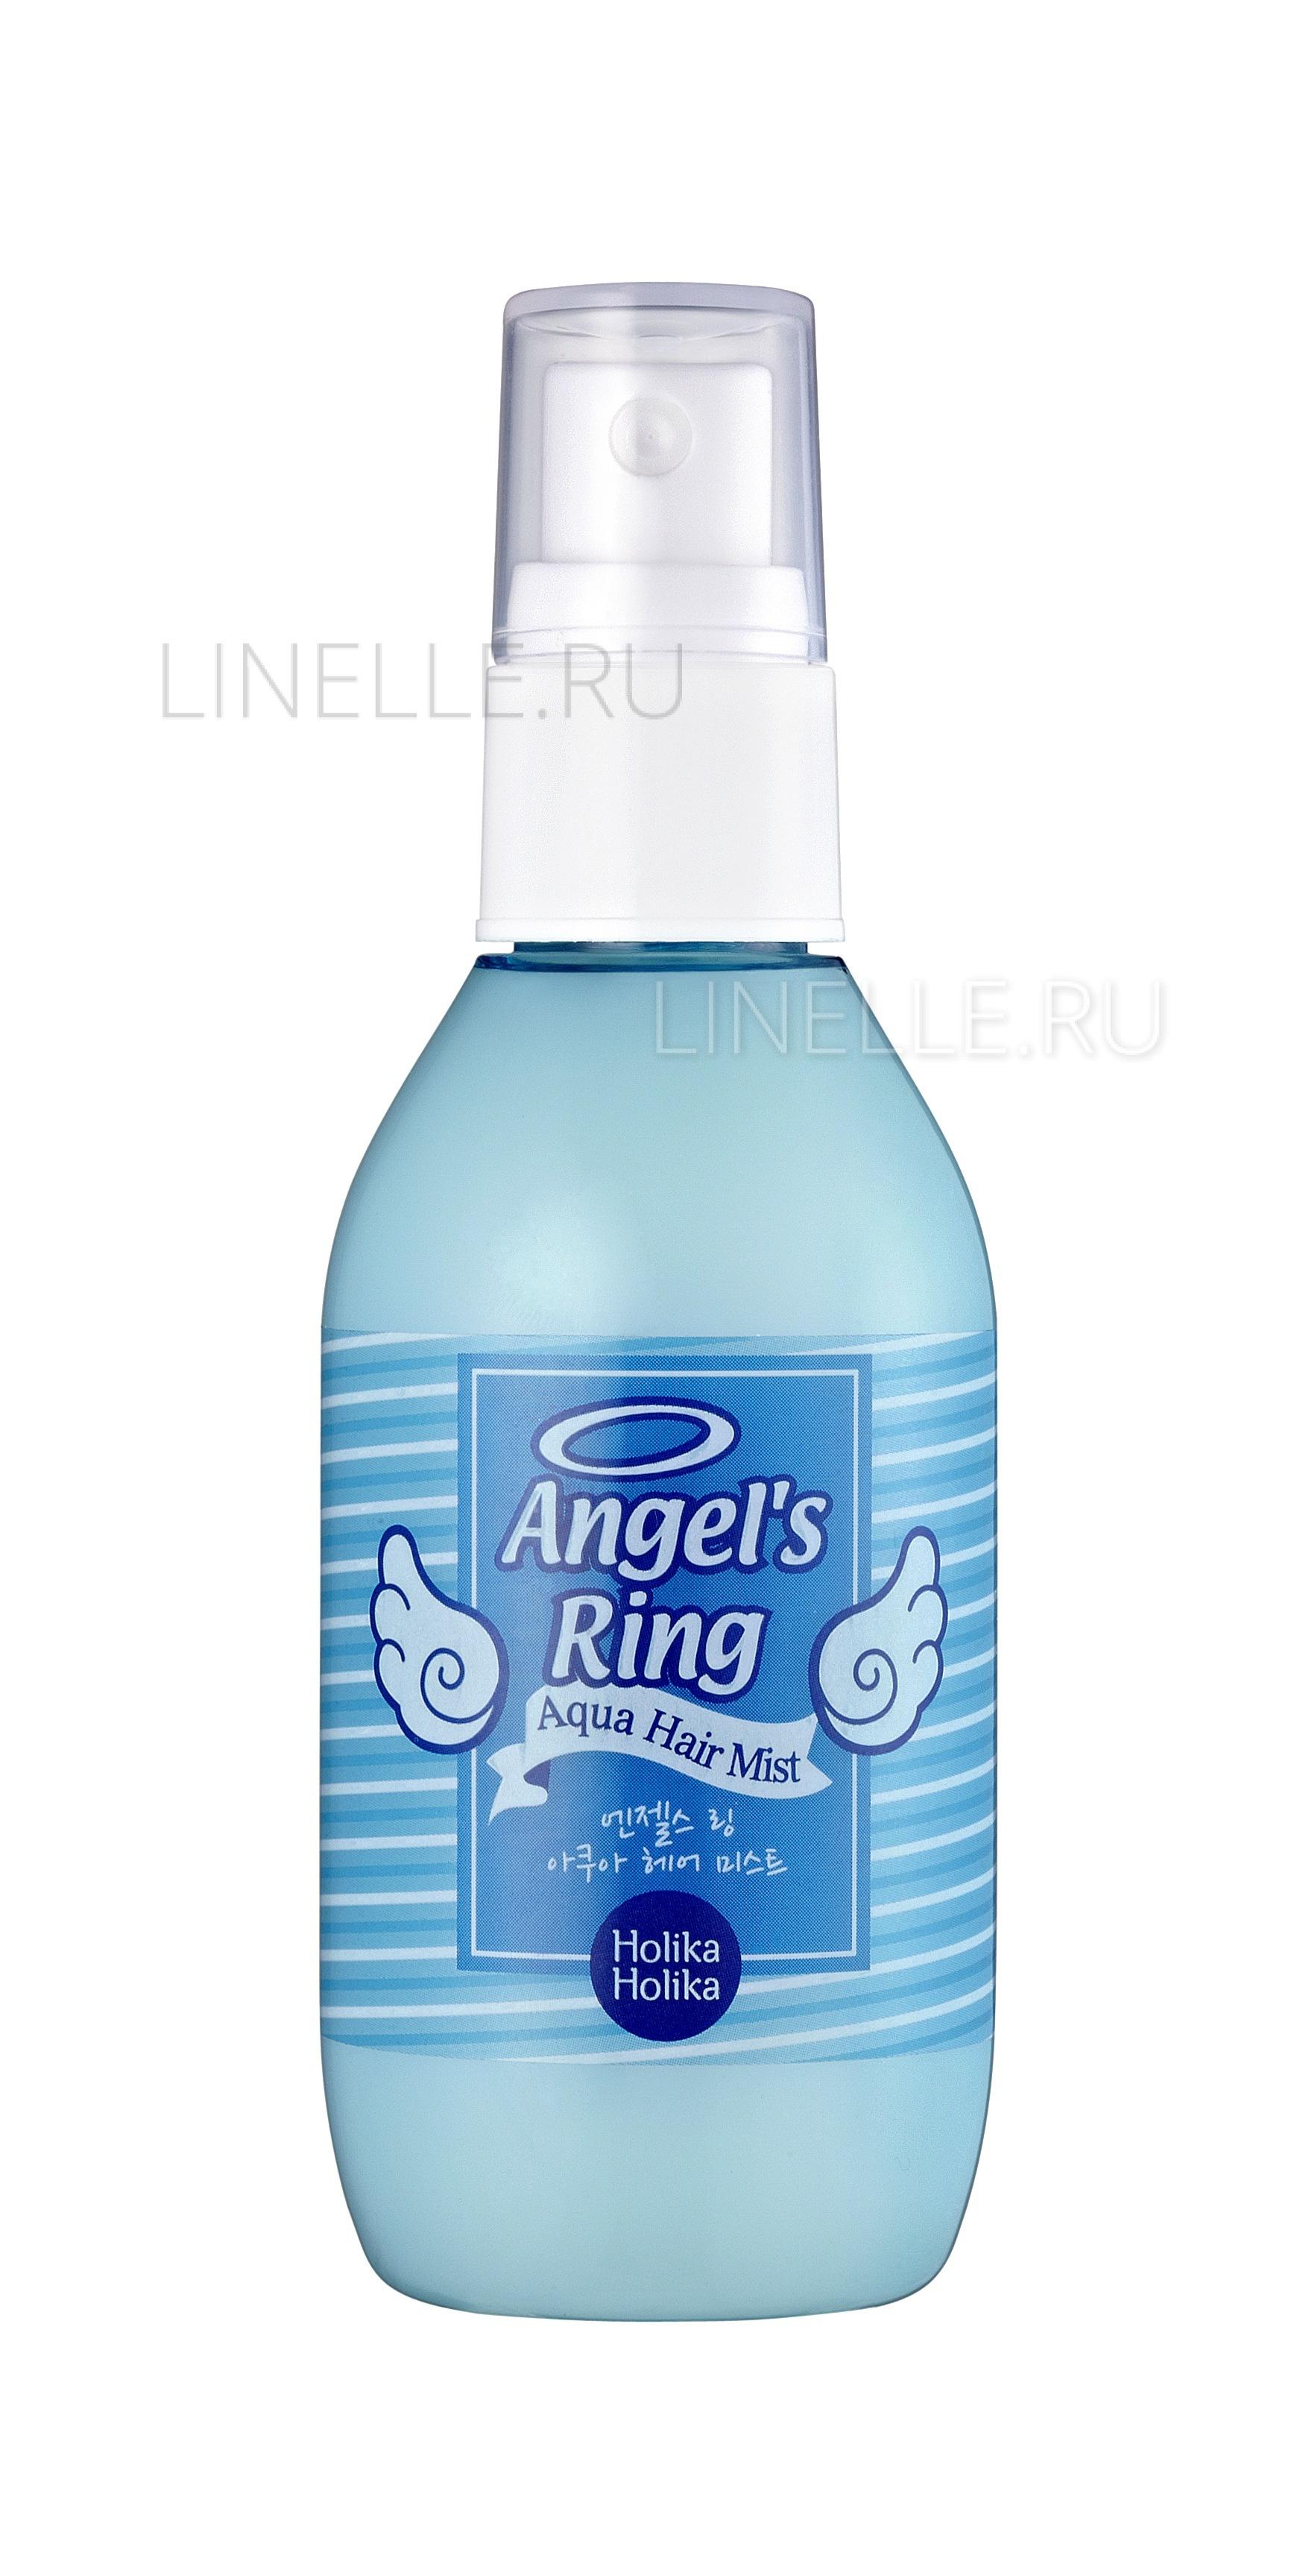 HOLIKA HOLIKA Angel's ring aqua hair mist